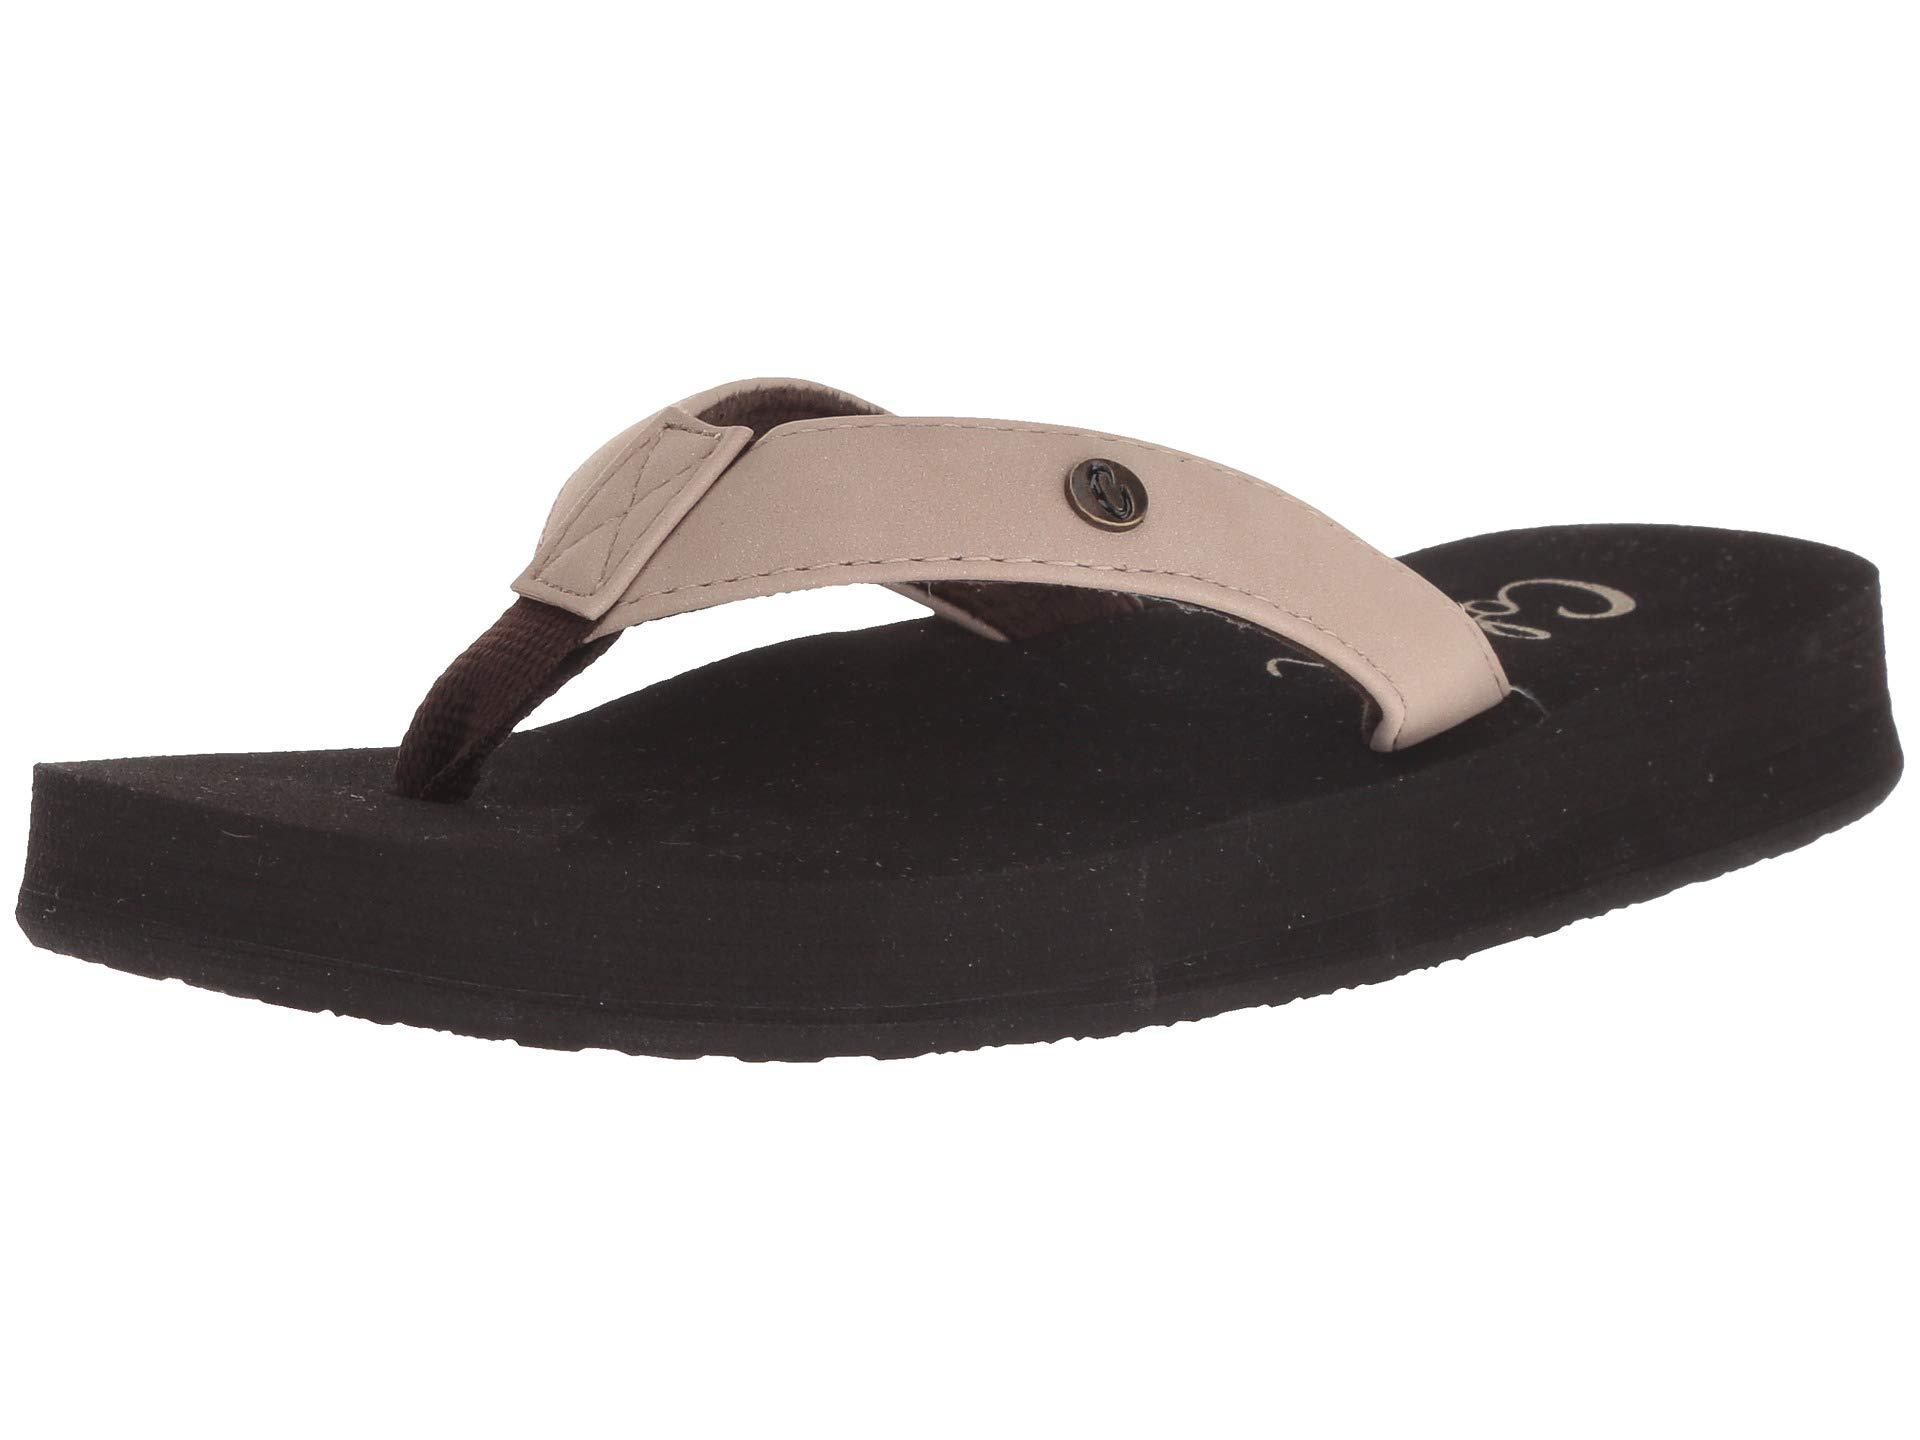 bf7360e79 Cobian - Cancun Bounce (black) Women s Sandals - Lyst. View fullscreen